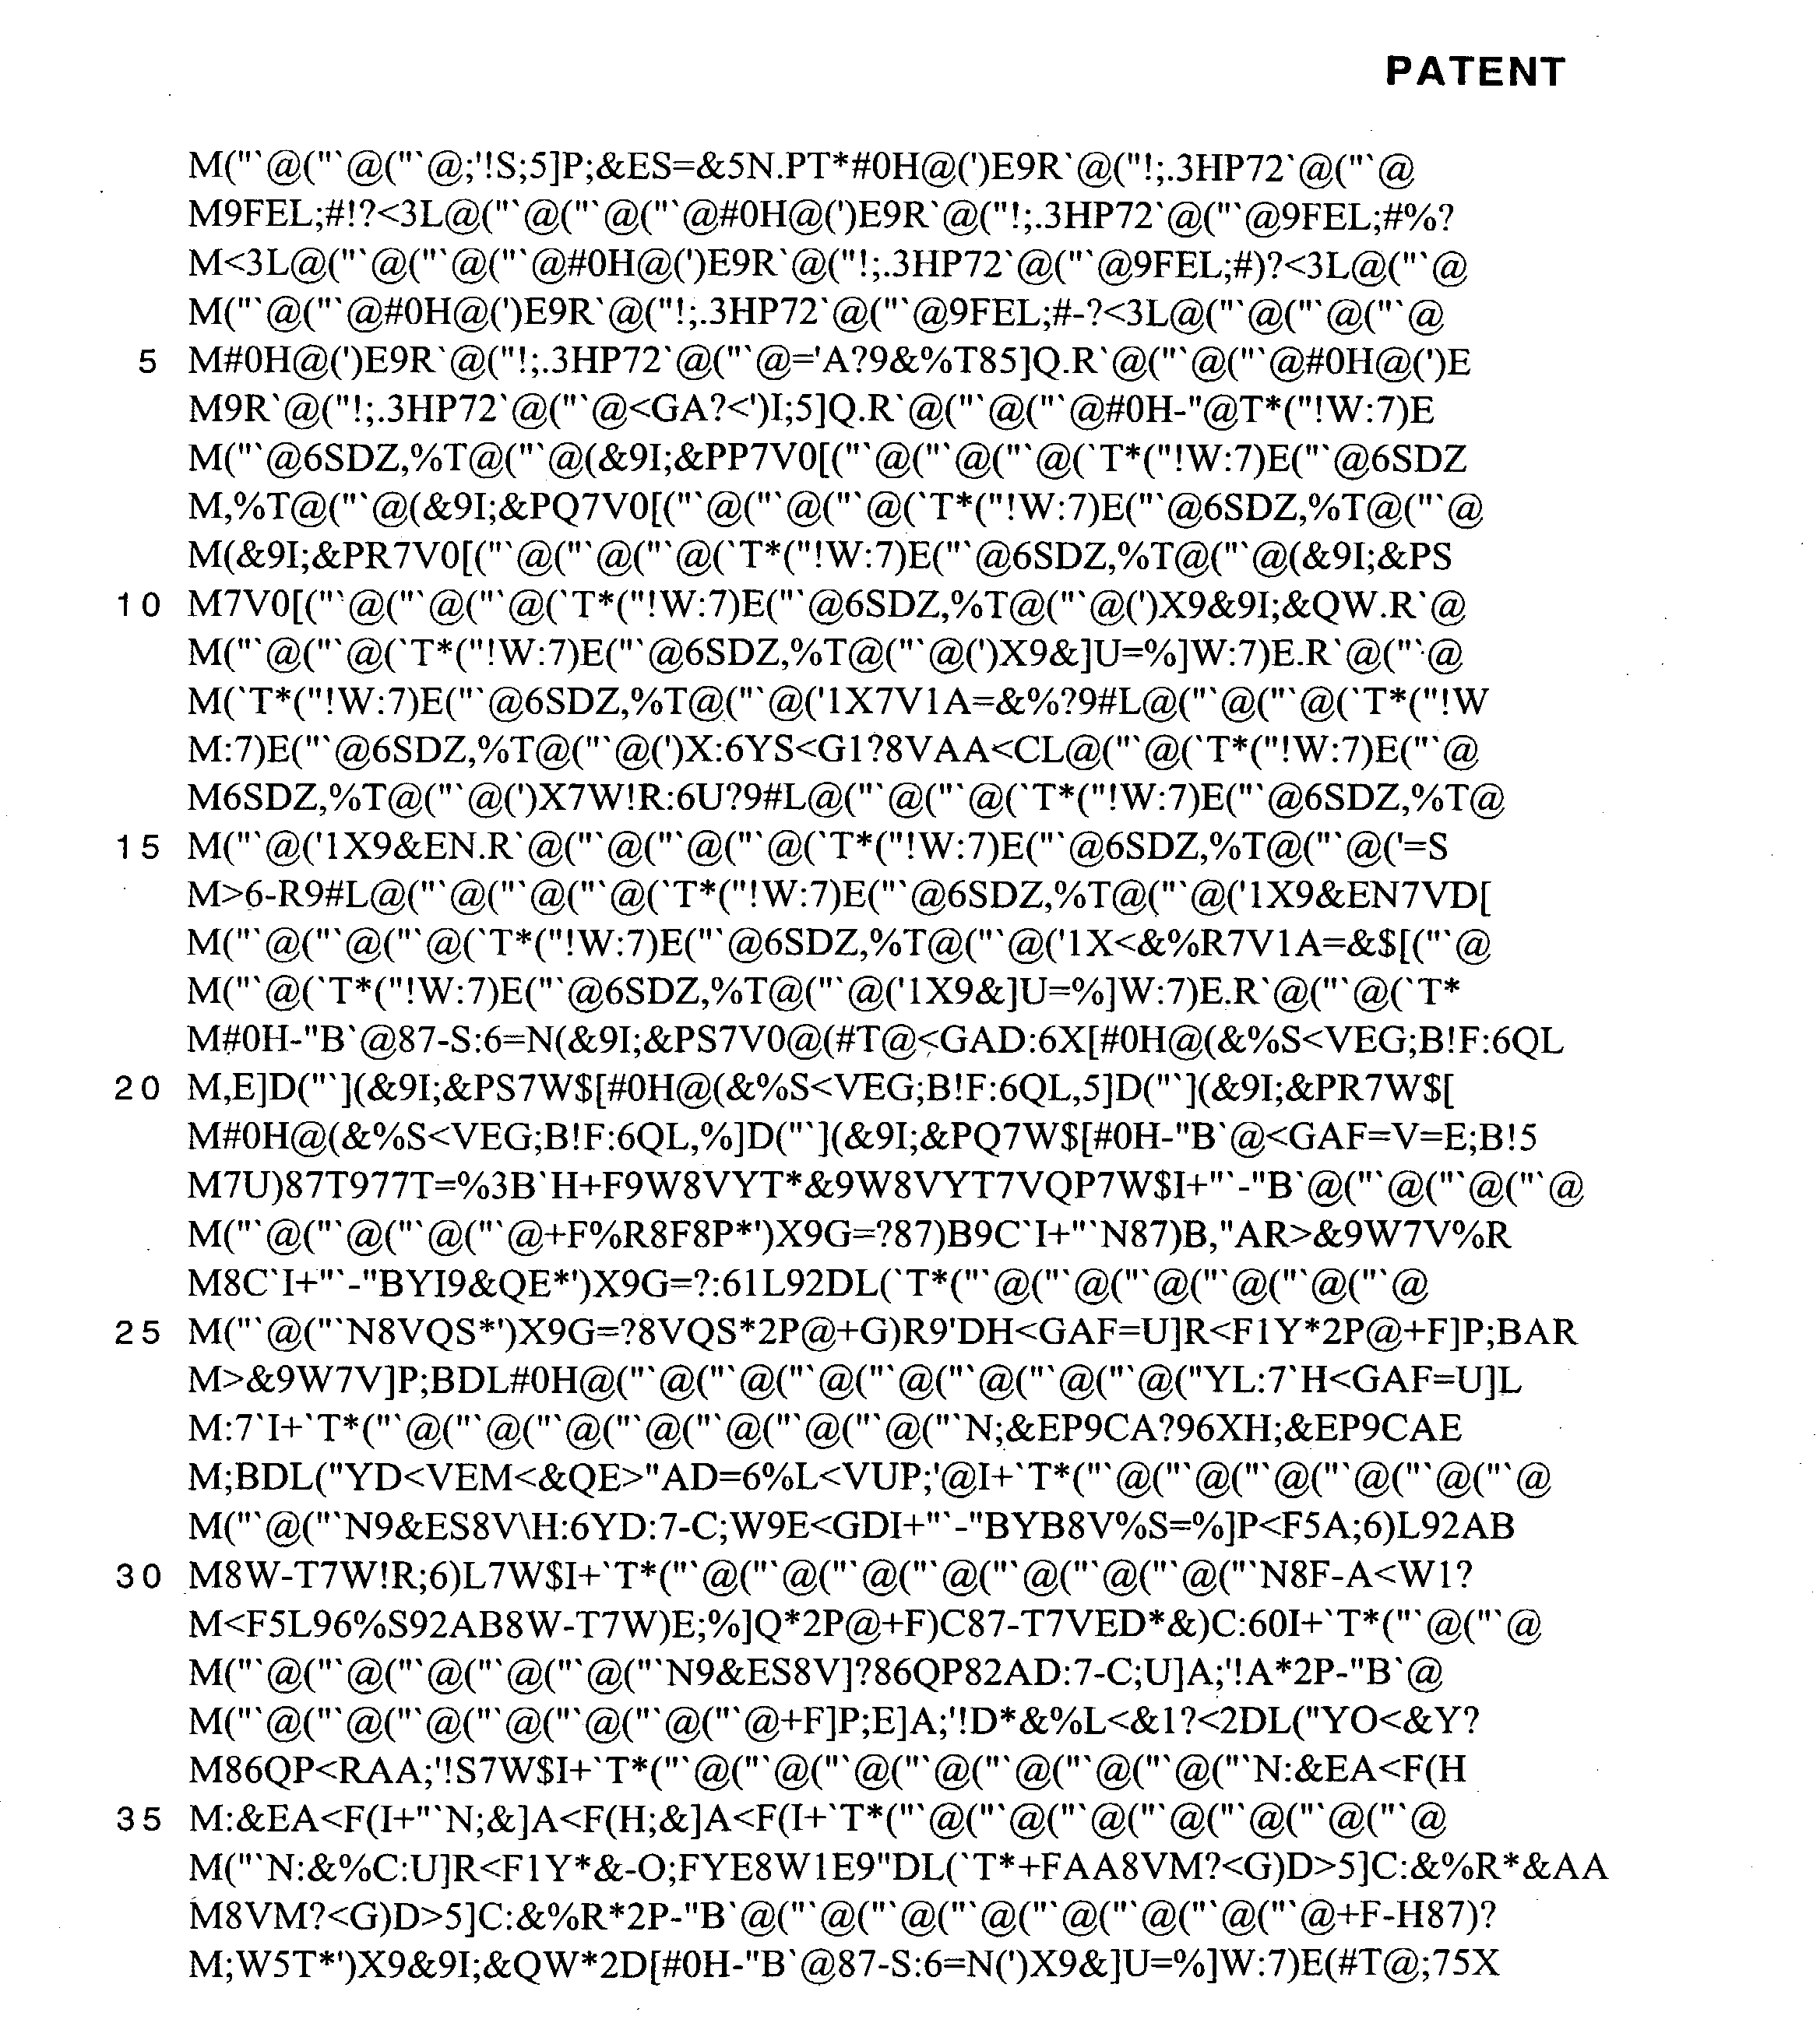 Figure US20030174721A1-20030918-P00042